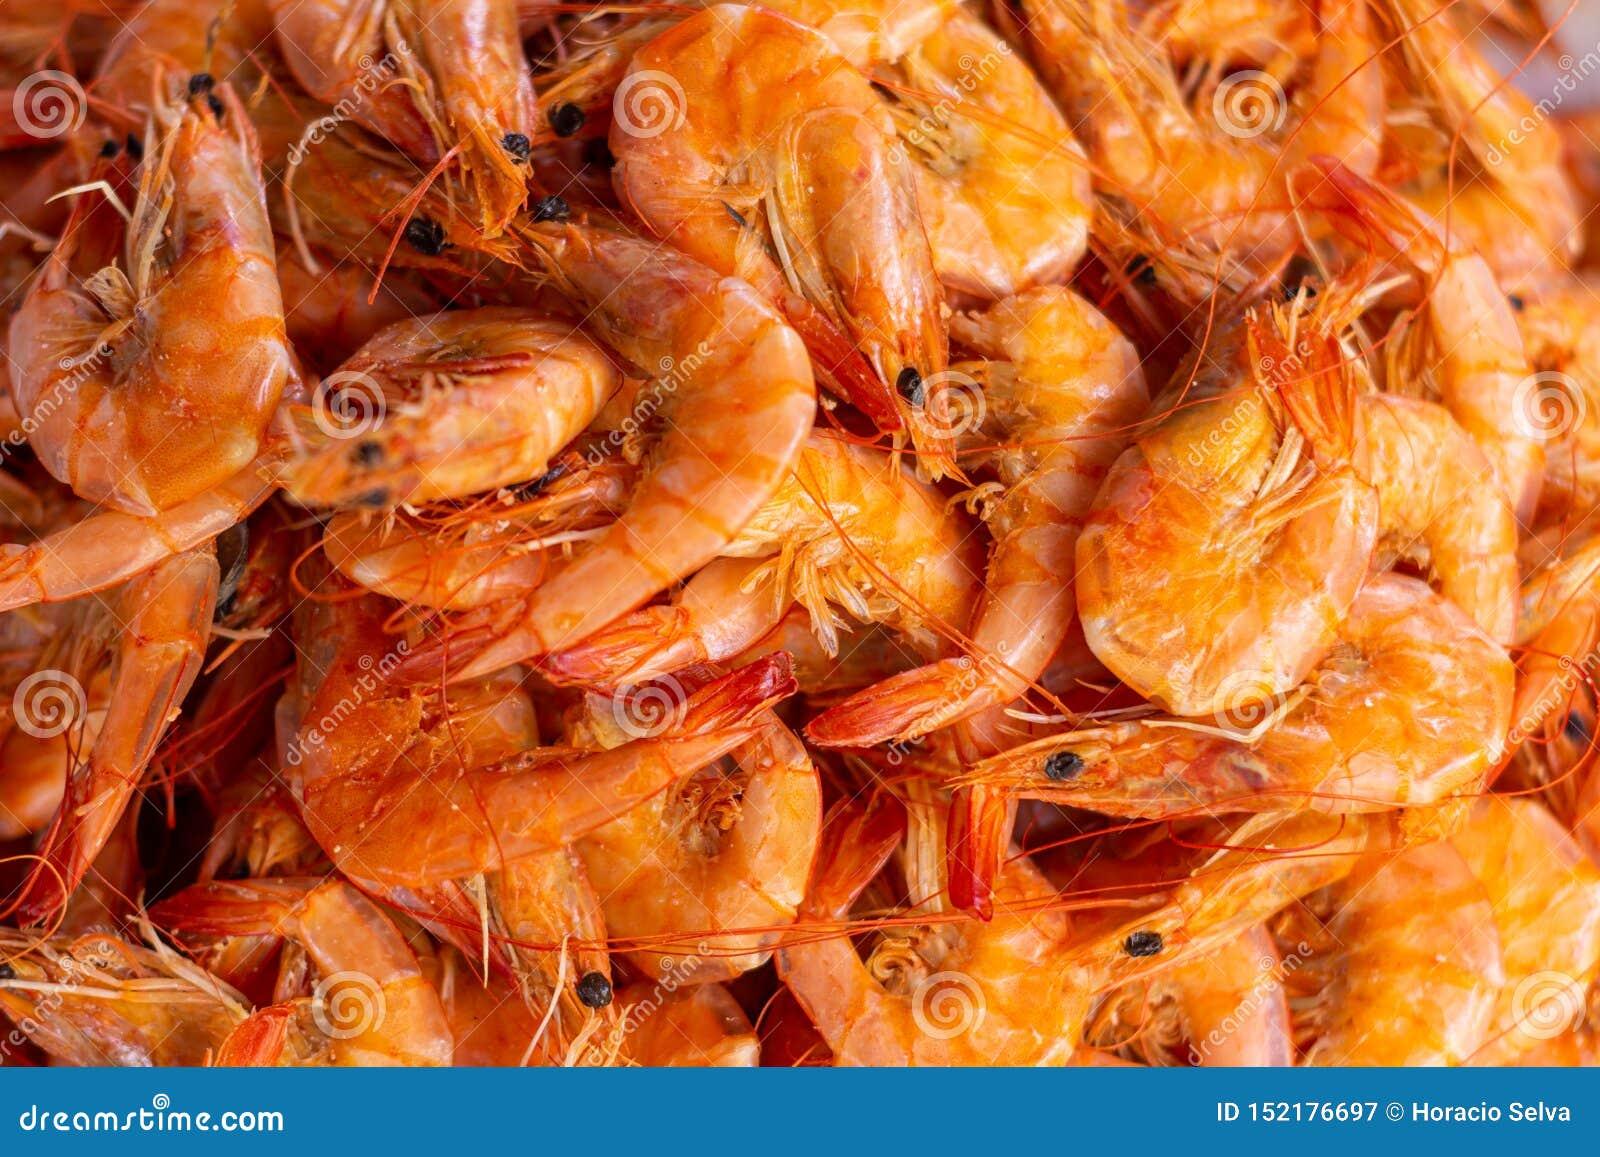 Crevette orange innombrable, nourriture marine fraîche